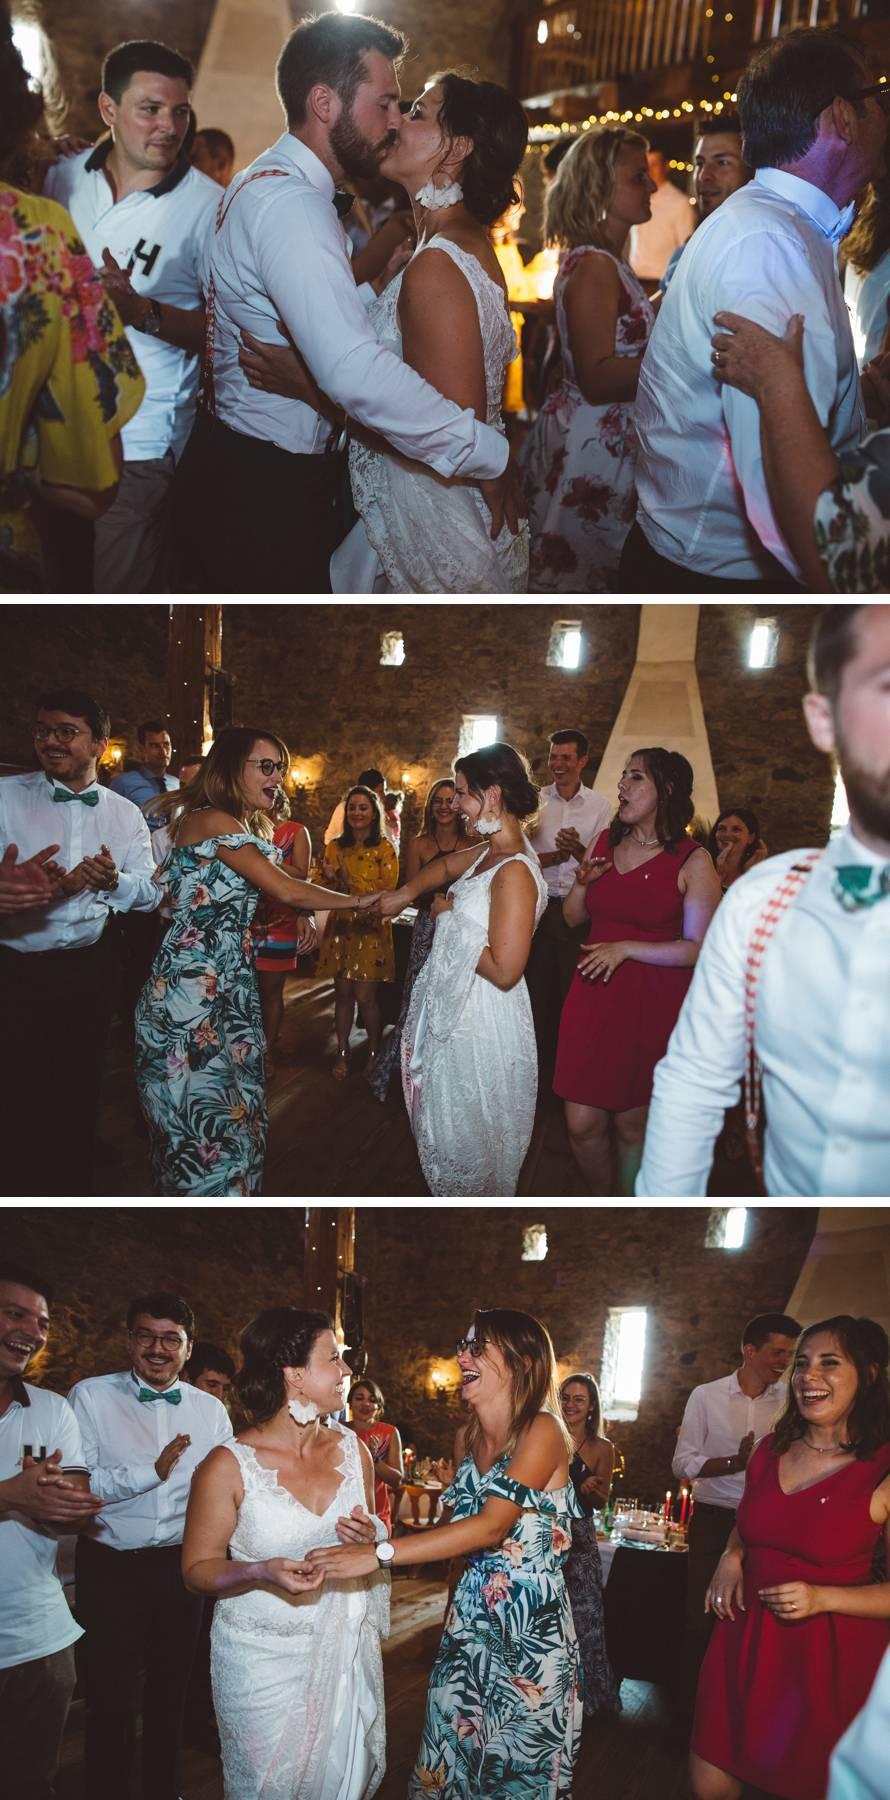 mariage-tropical-raben-horben_0032.jpg